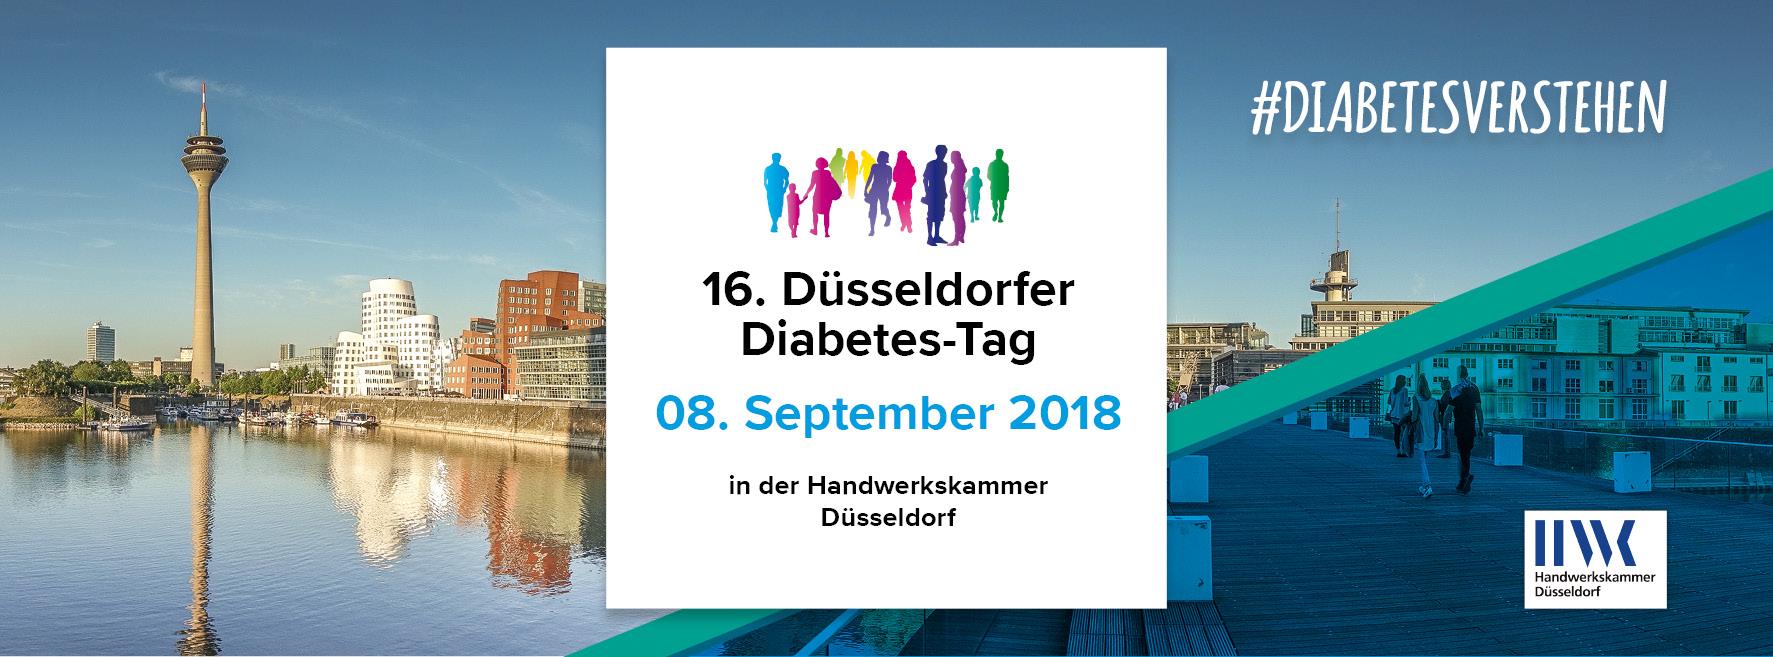 Banner Düsseldorfer Diabetes-Tag 2018